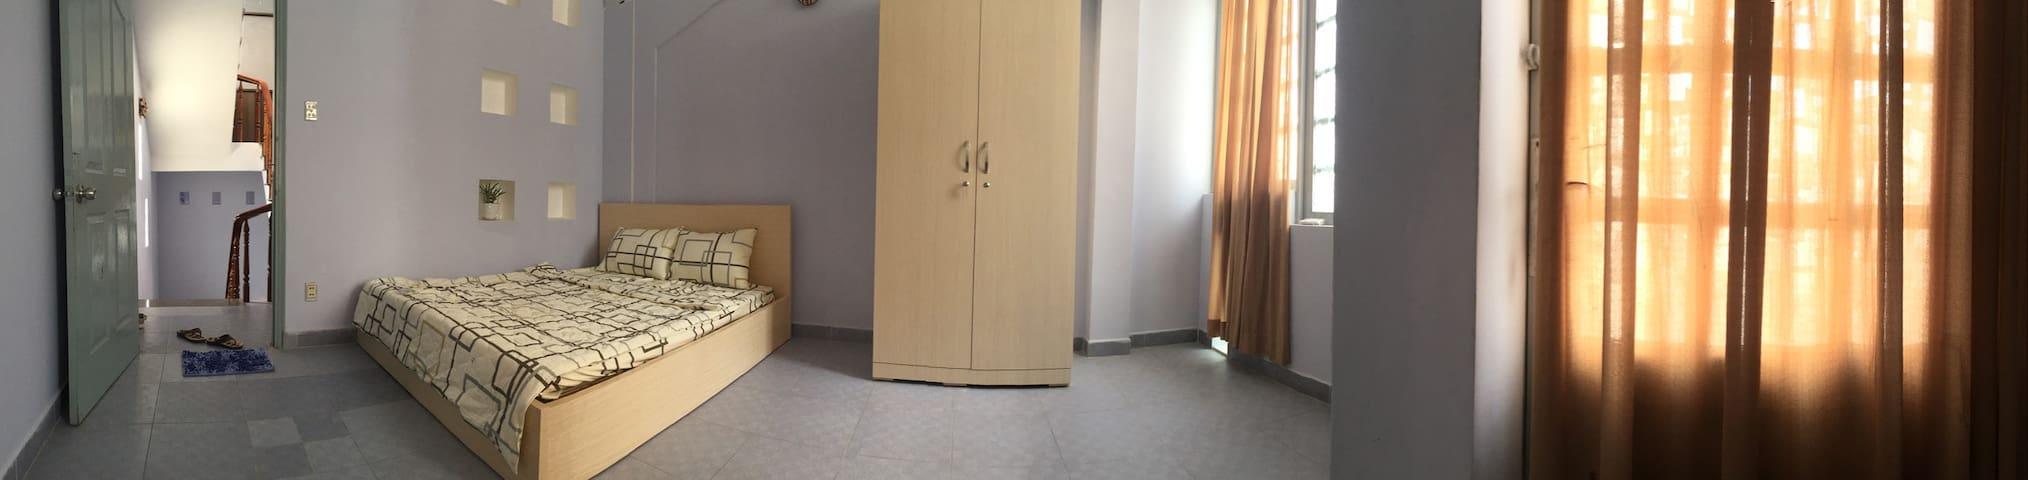 New, reasonable, private medium rooms, Dist 3